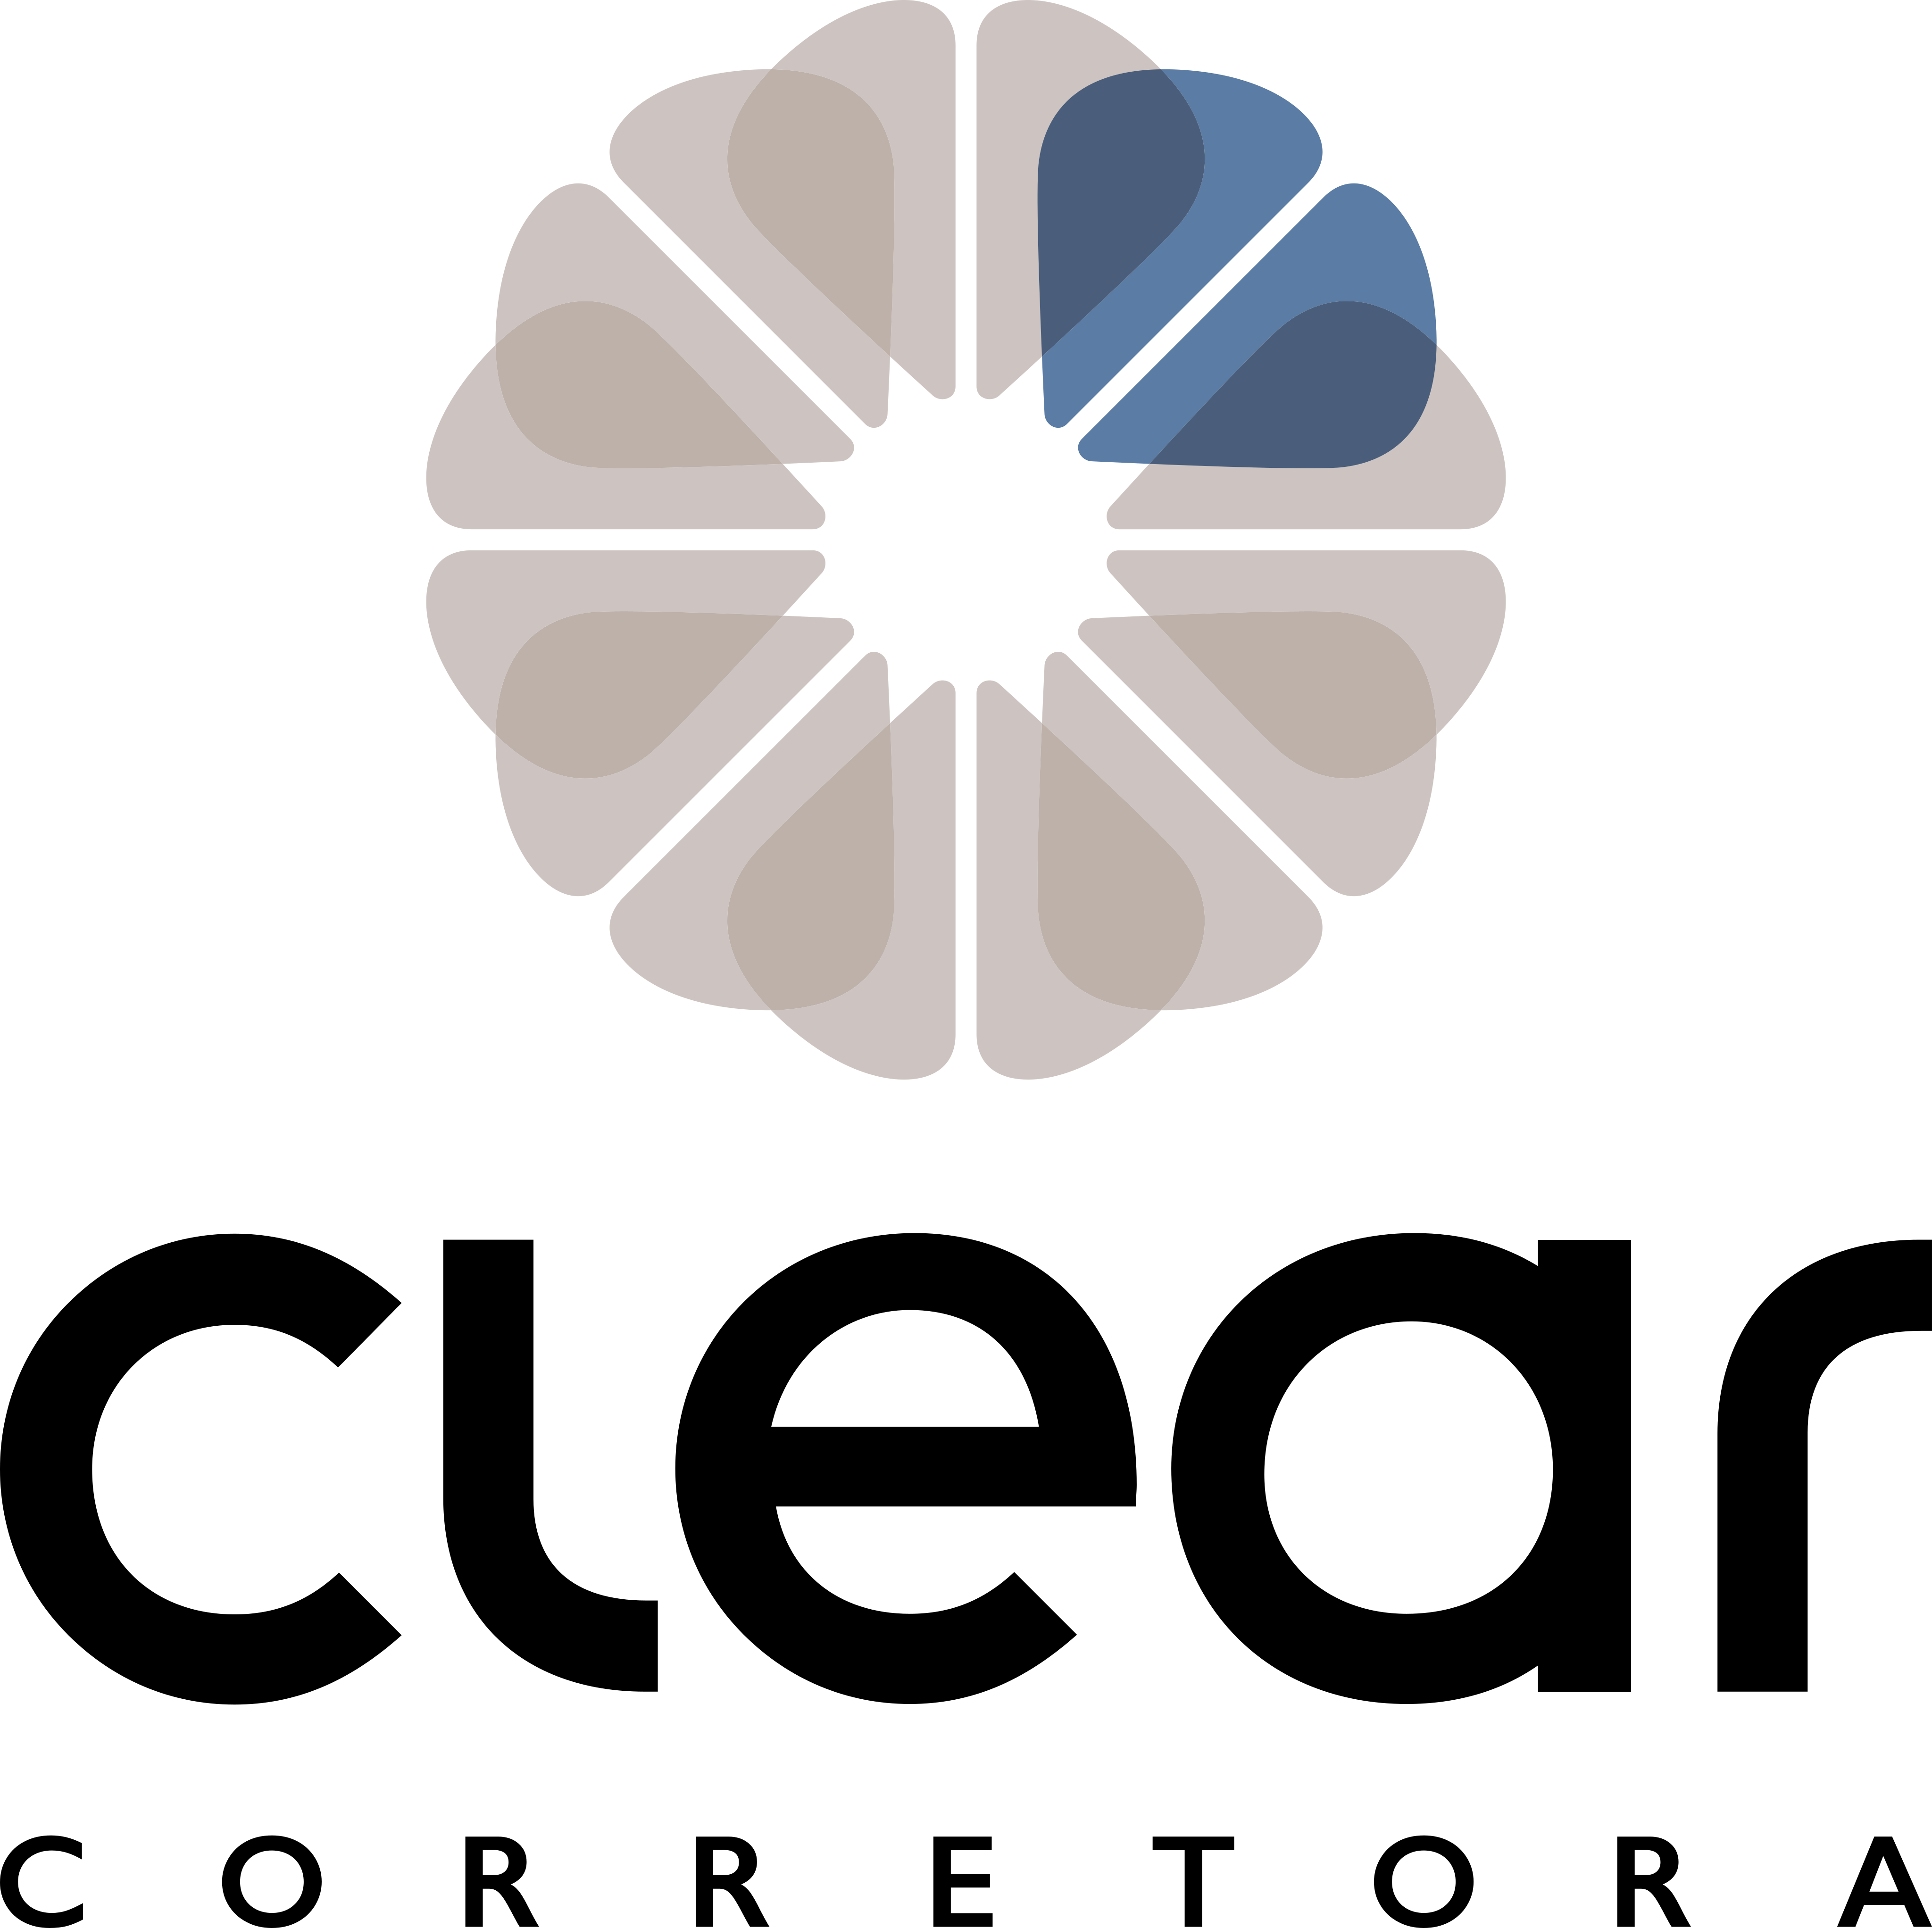 clear corretora logo 1 - Clear Corretora Logo